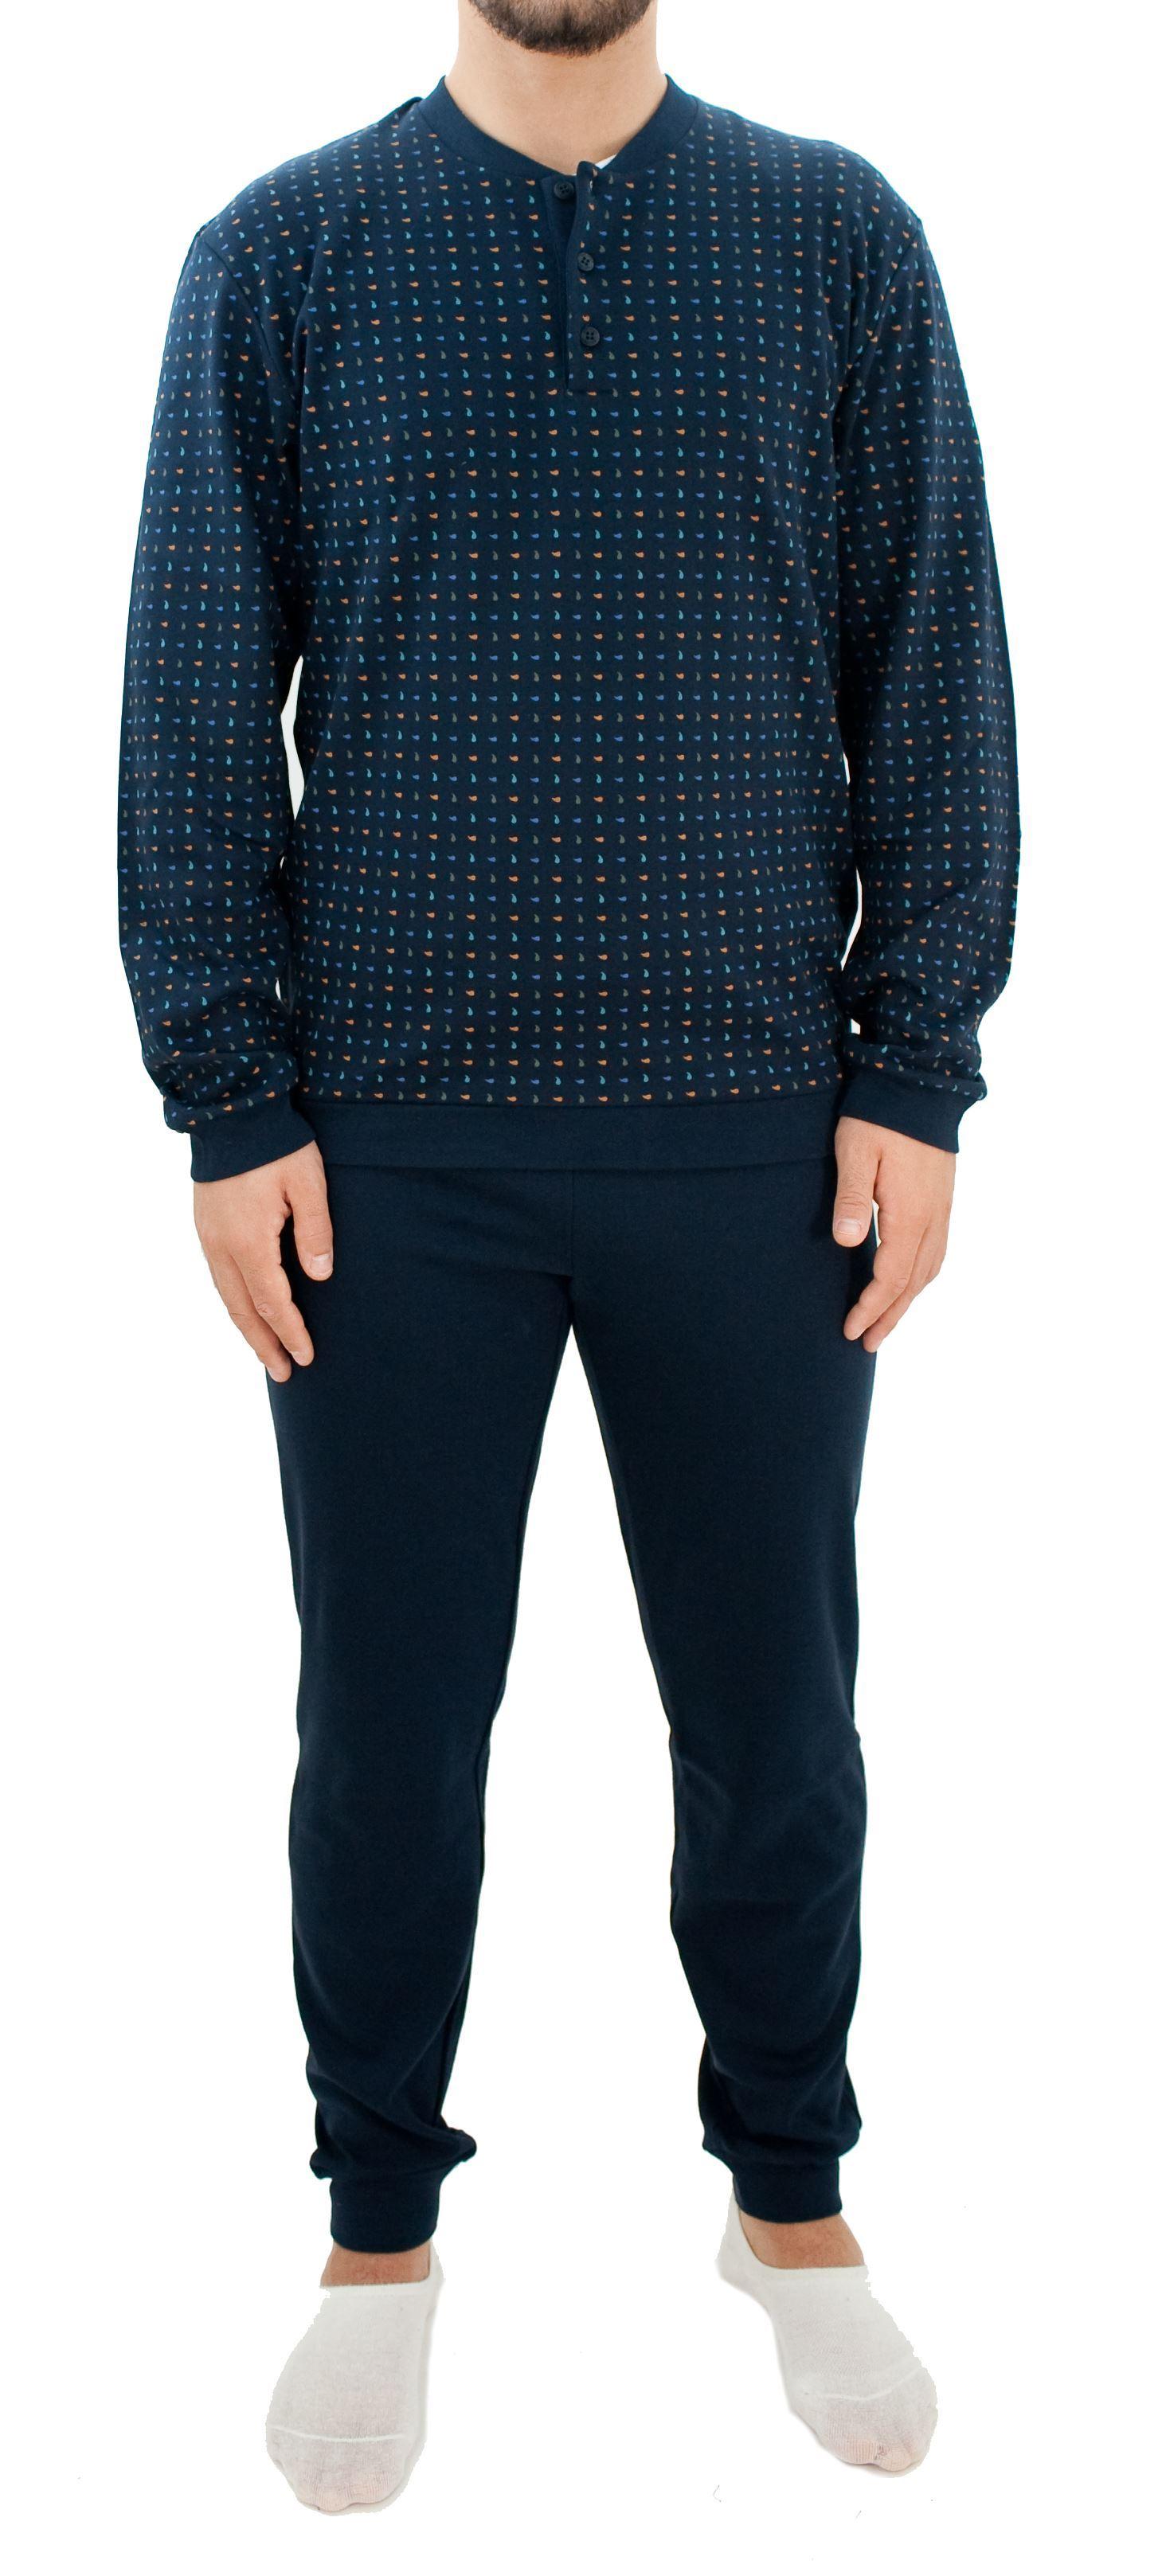 Picture of Men's pajamas no collar